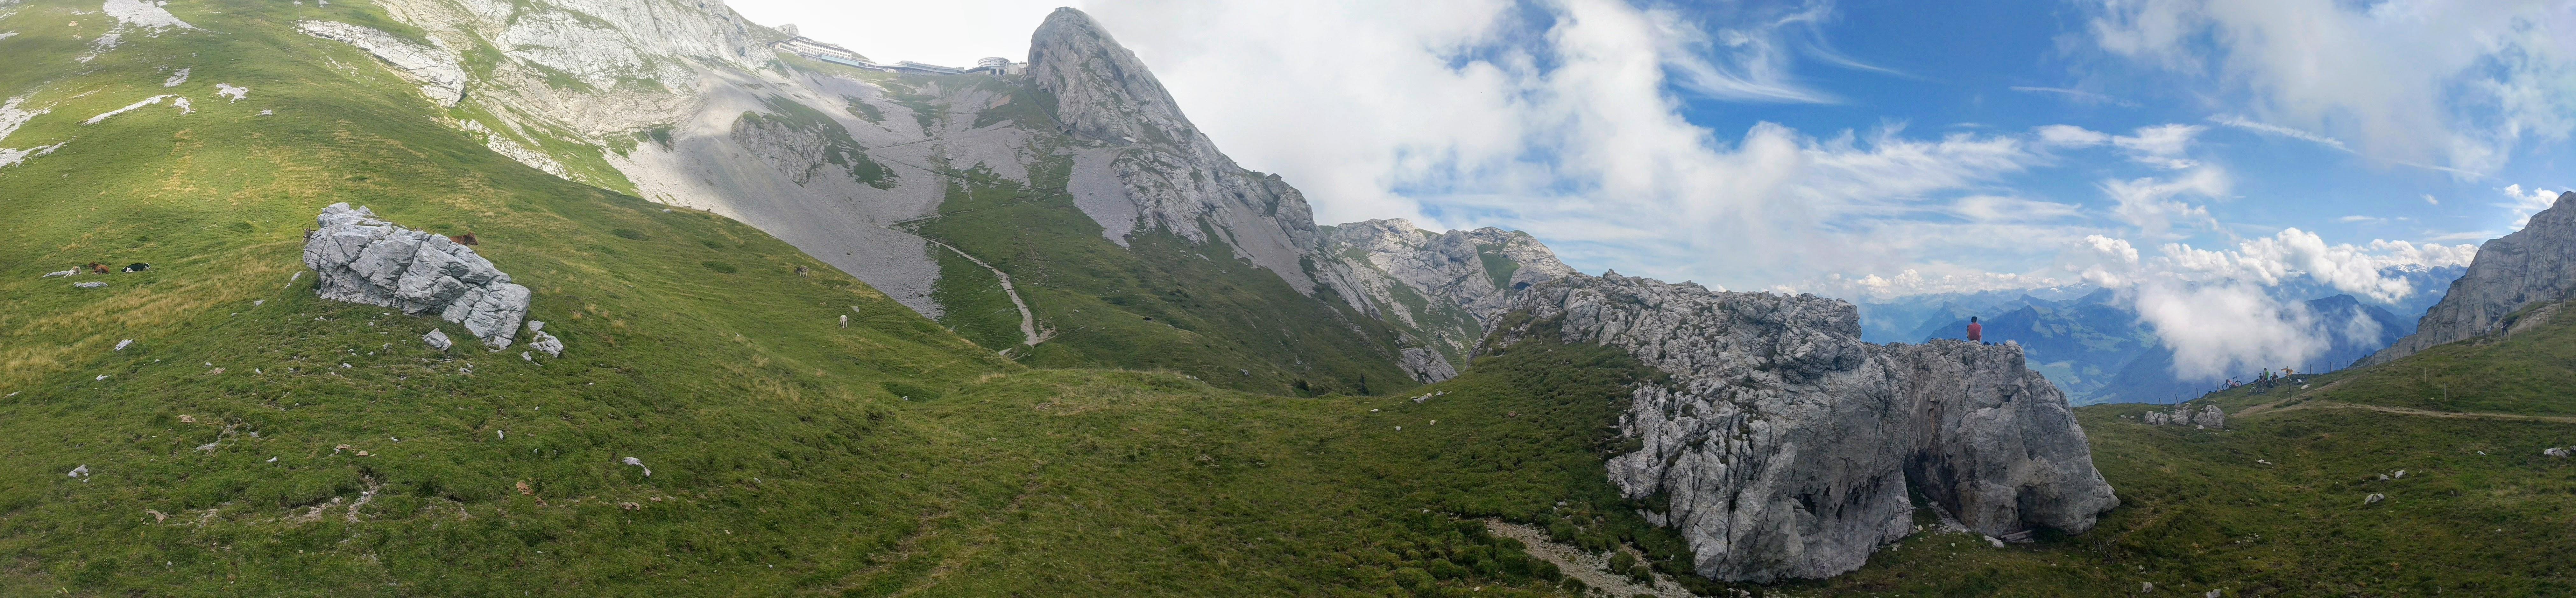 View of land below Mt Pilatus